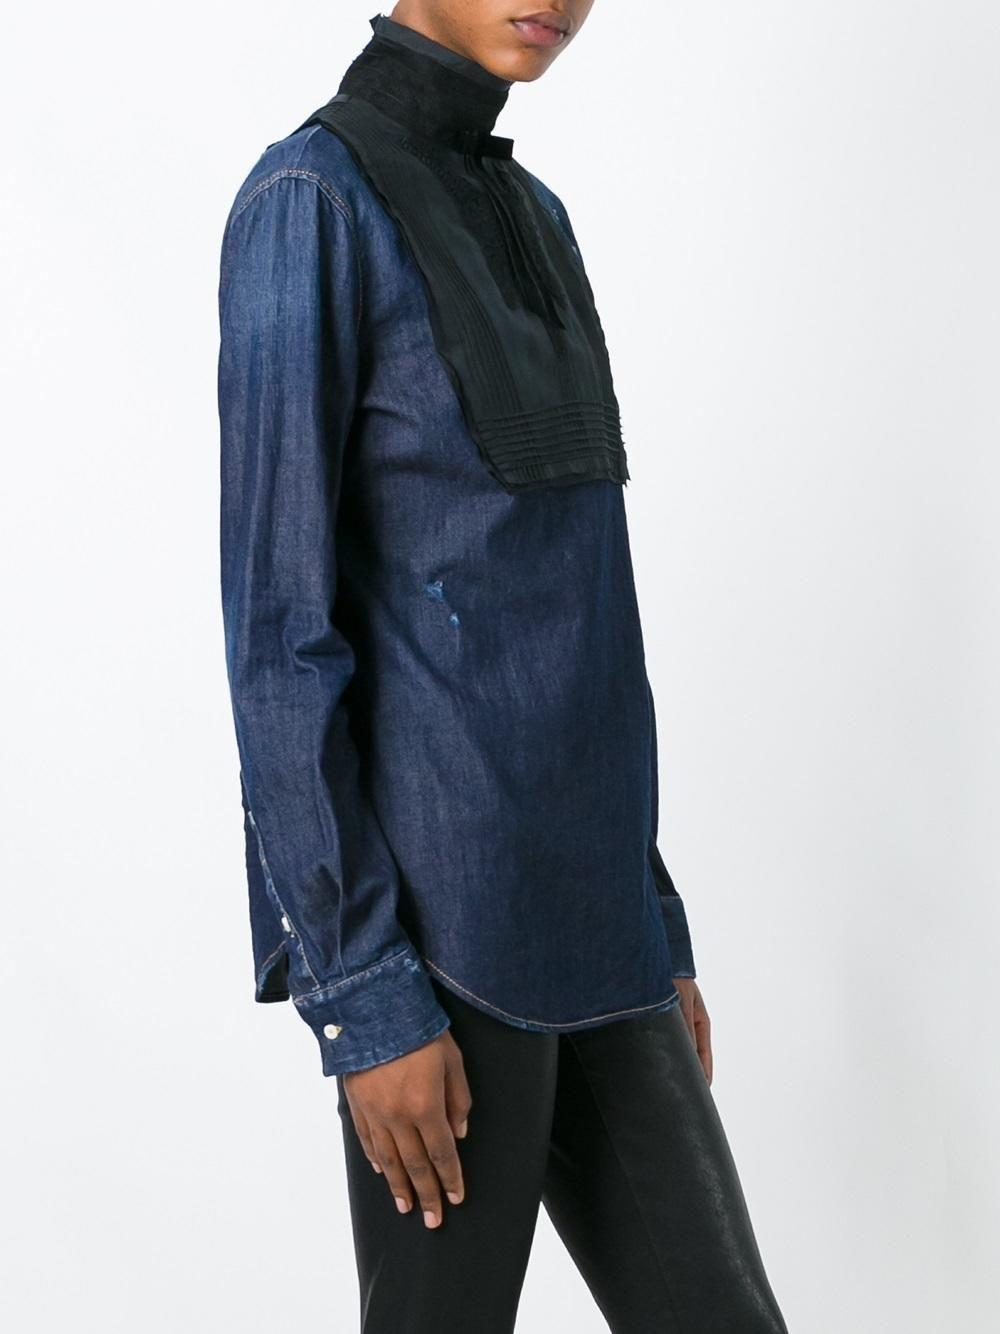 Dsquared2 'Victorian' shirt